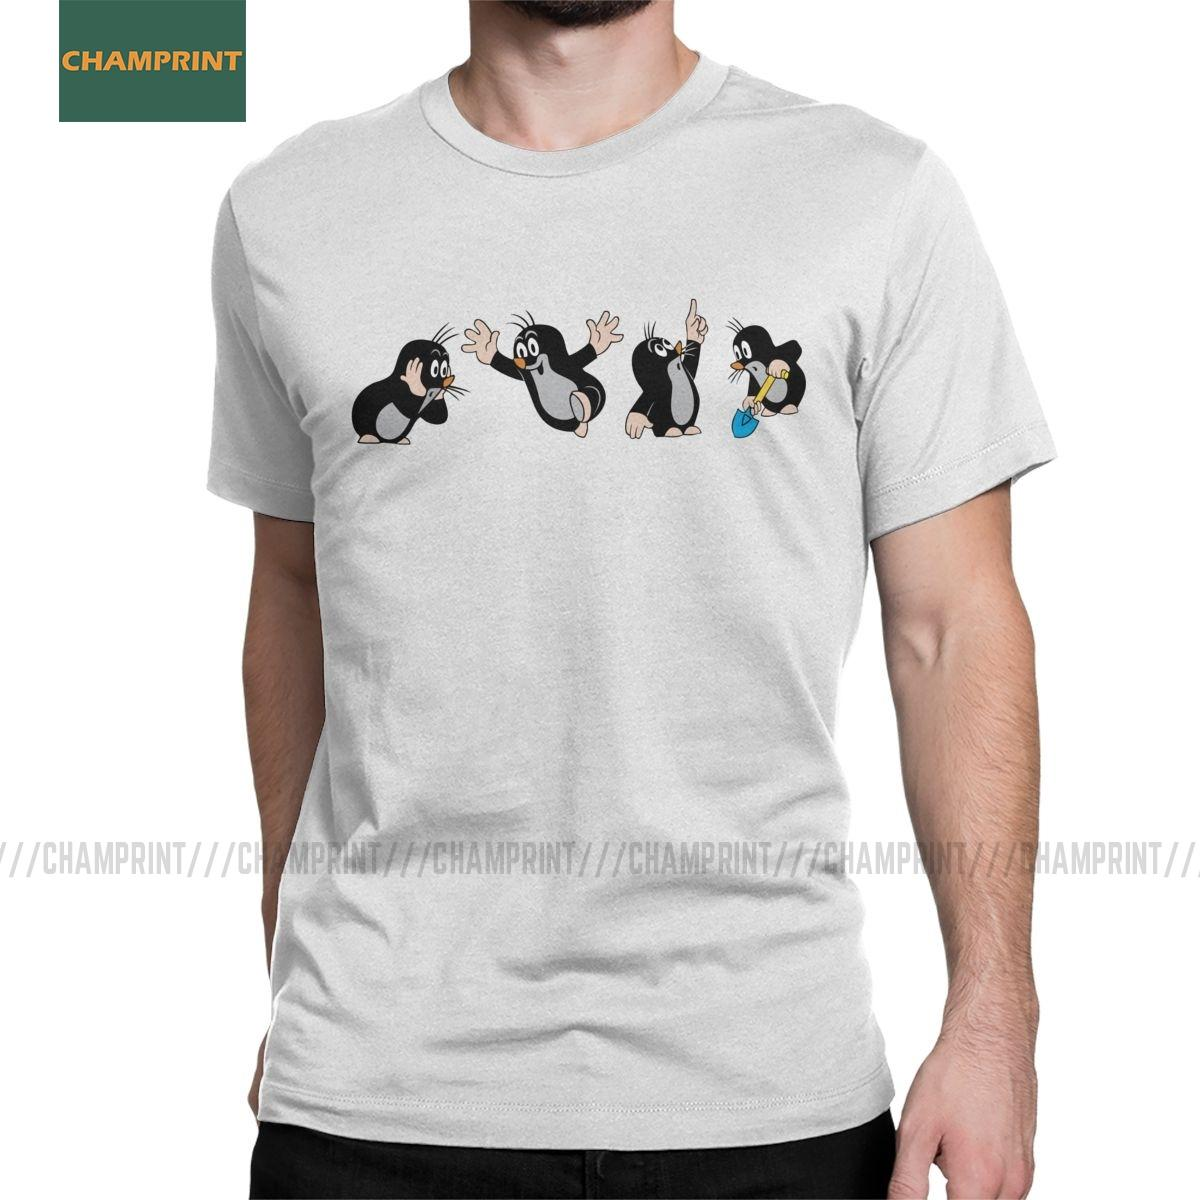 Novedad Europea Mole Comics T-Shirts para Hombre Camiseta de algodón Krtek Poco Maulwurf corto lindo de la historieta de la manga Ropa 6XL